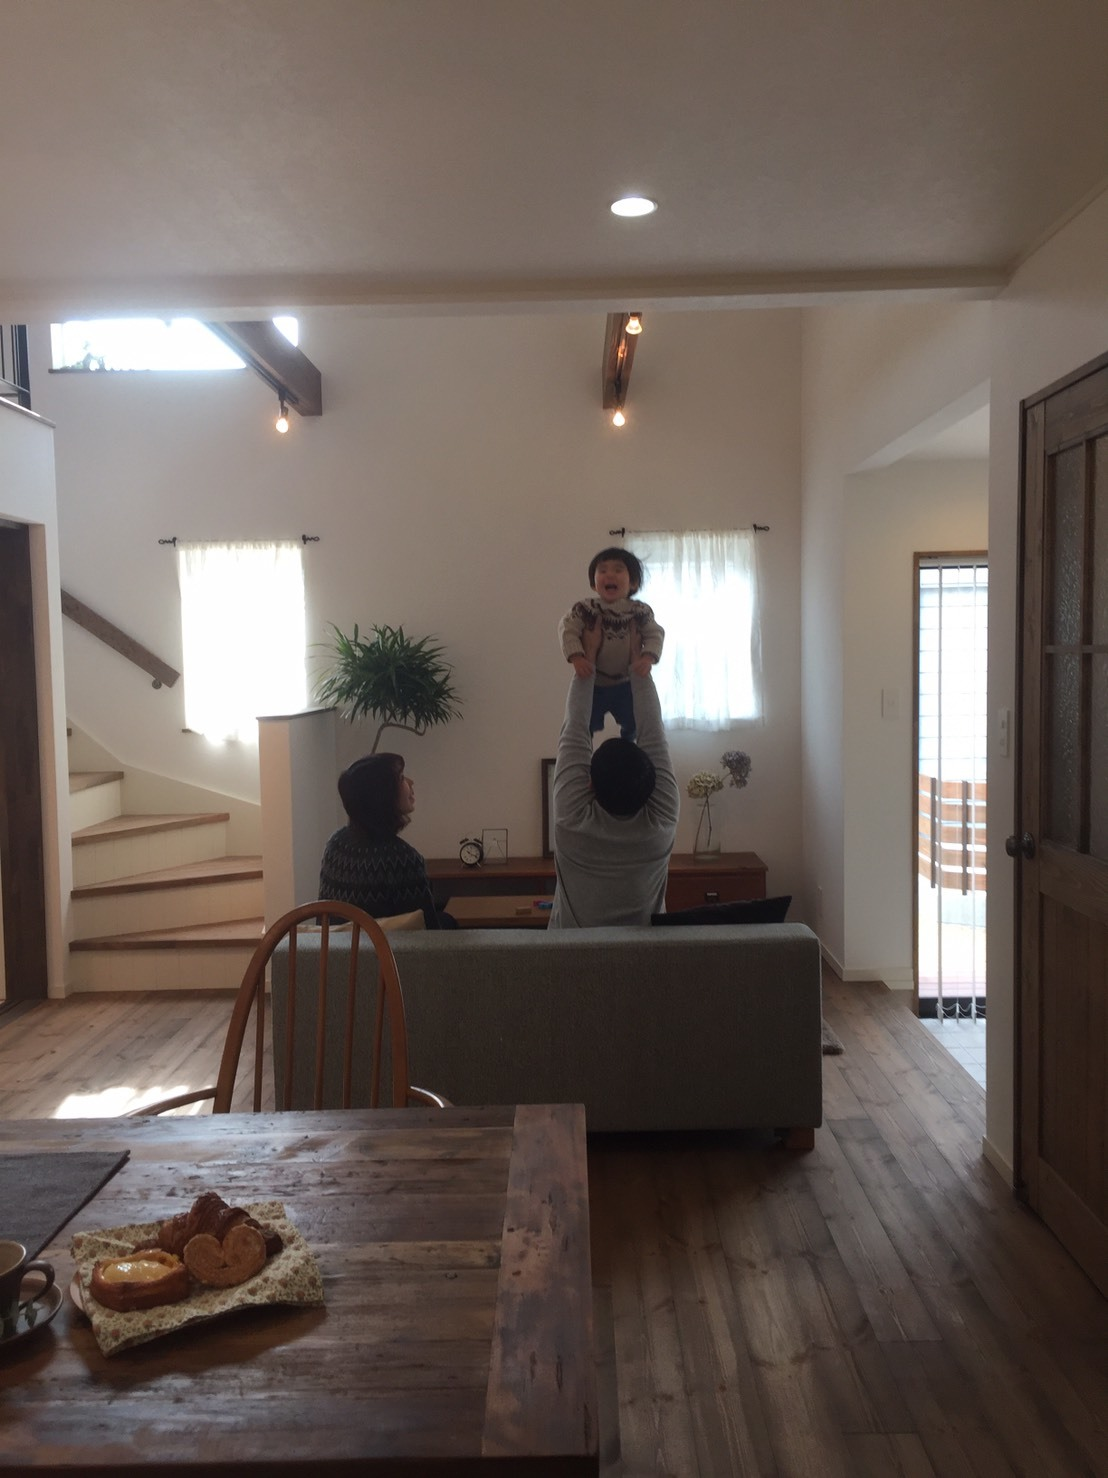 WEB内覧会〜スキップフロアとコンサバトリーのあるカフェのようなおうち〜_c0274374_18261978.jpeg